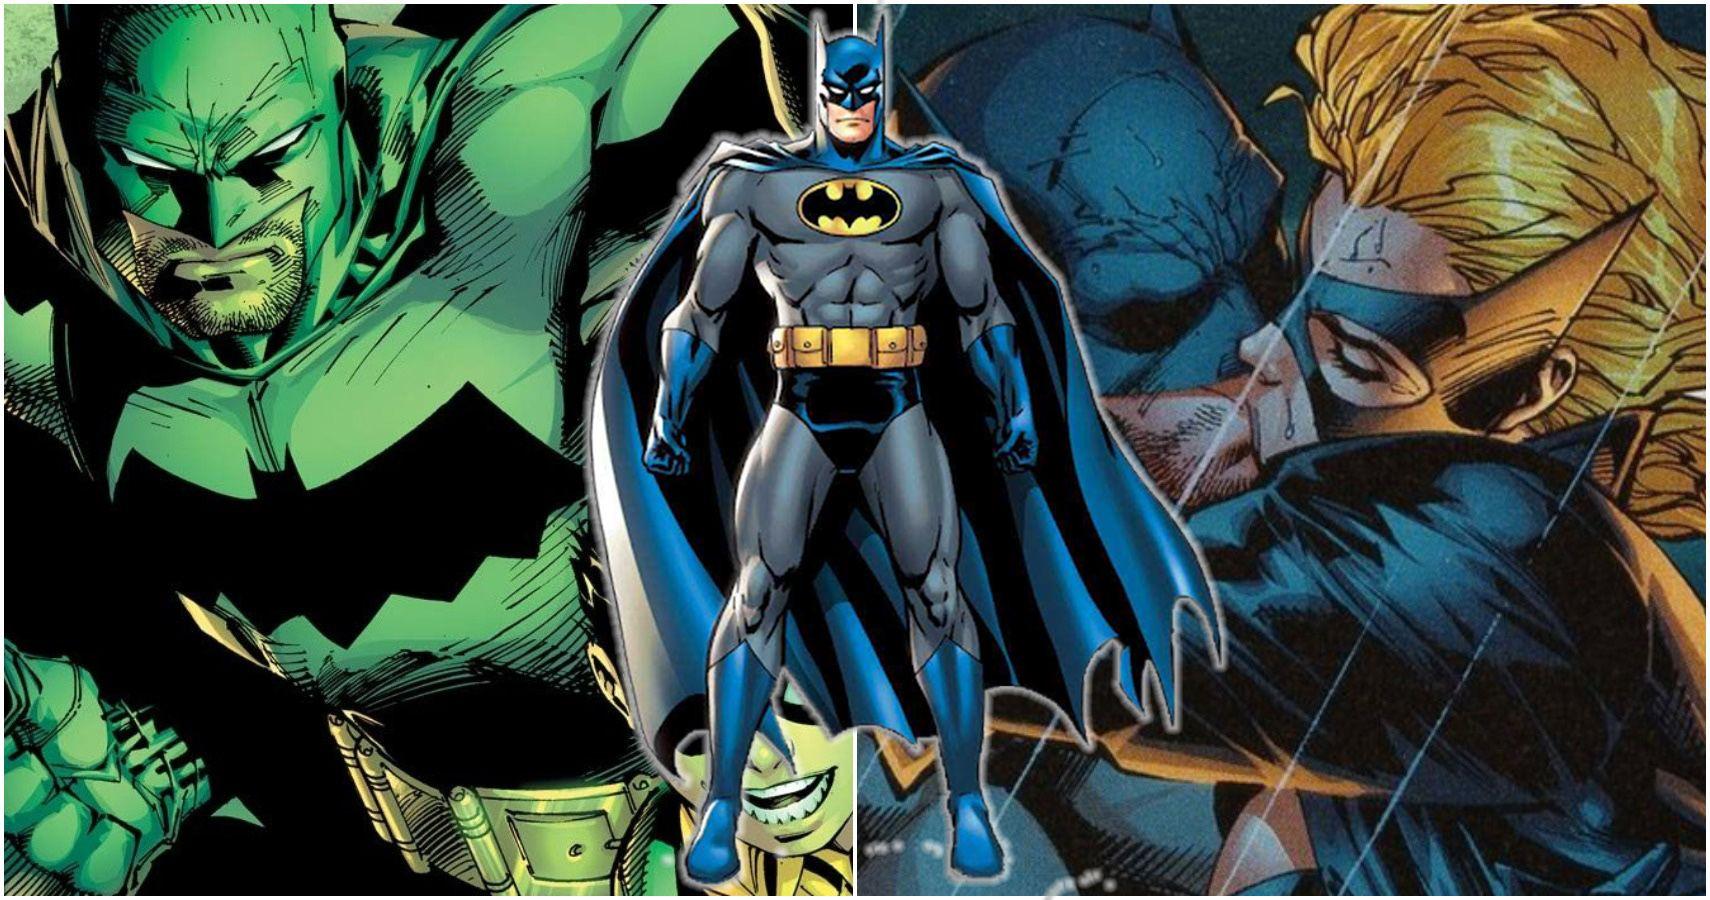 WarnerBros.com | Batman Day is September 19 | Articles